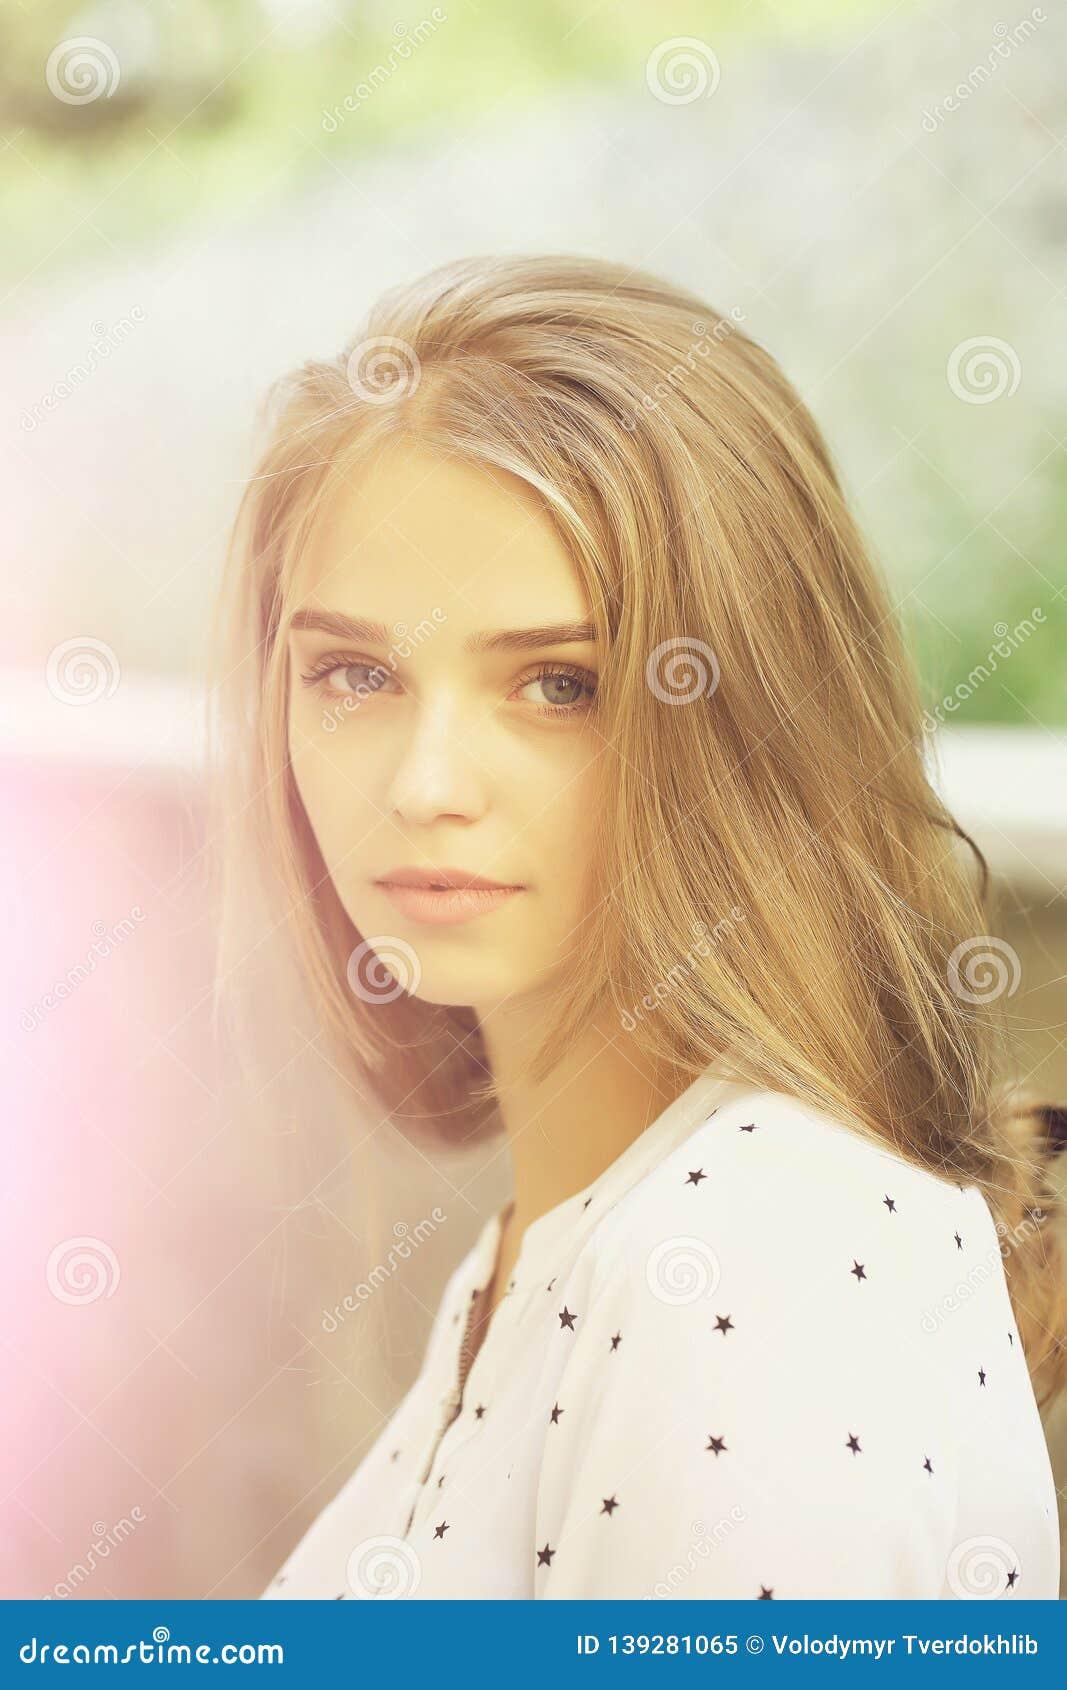 Pretty girls with blonde hair